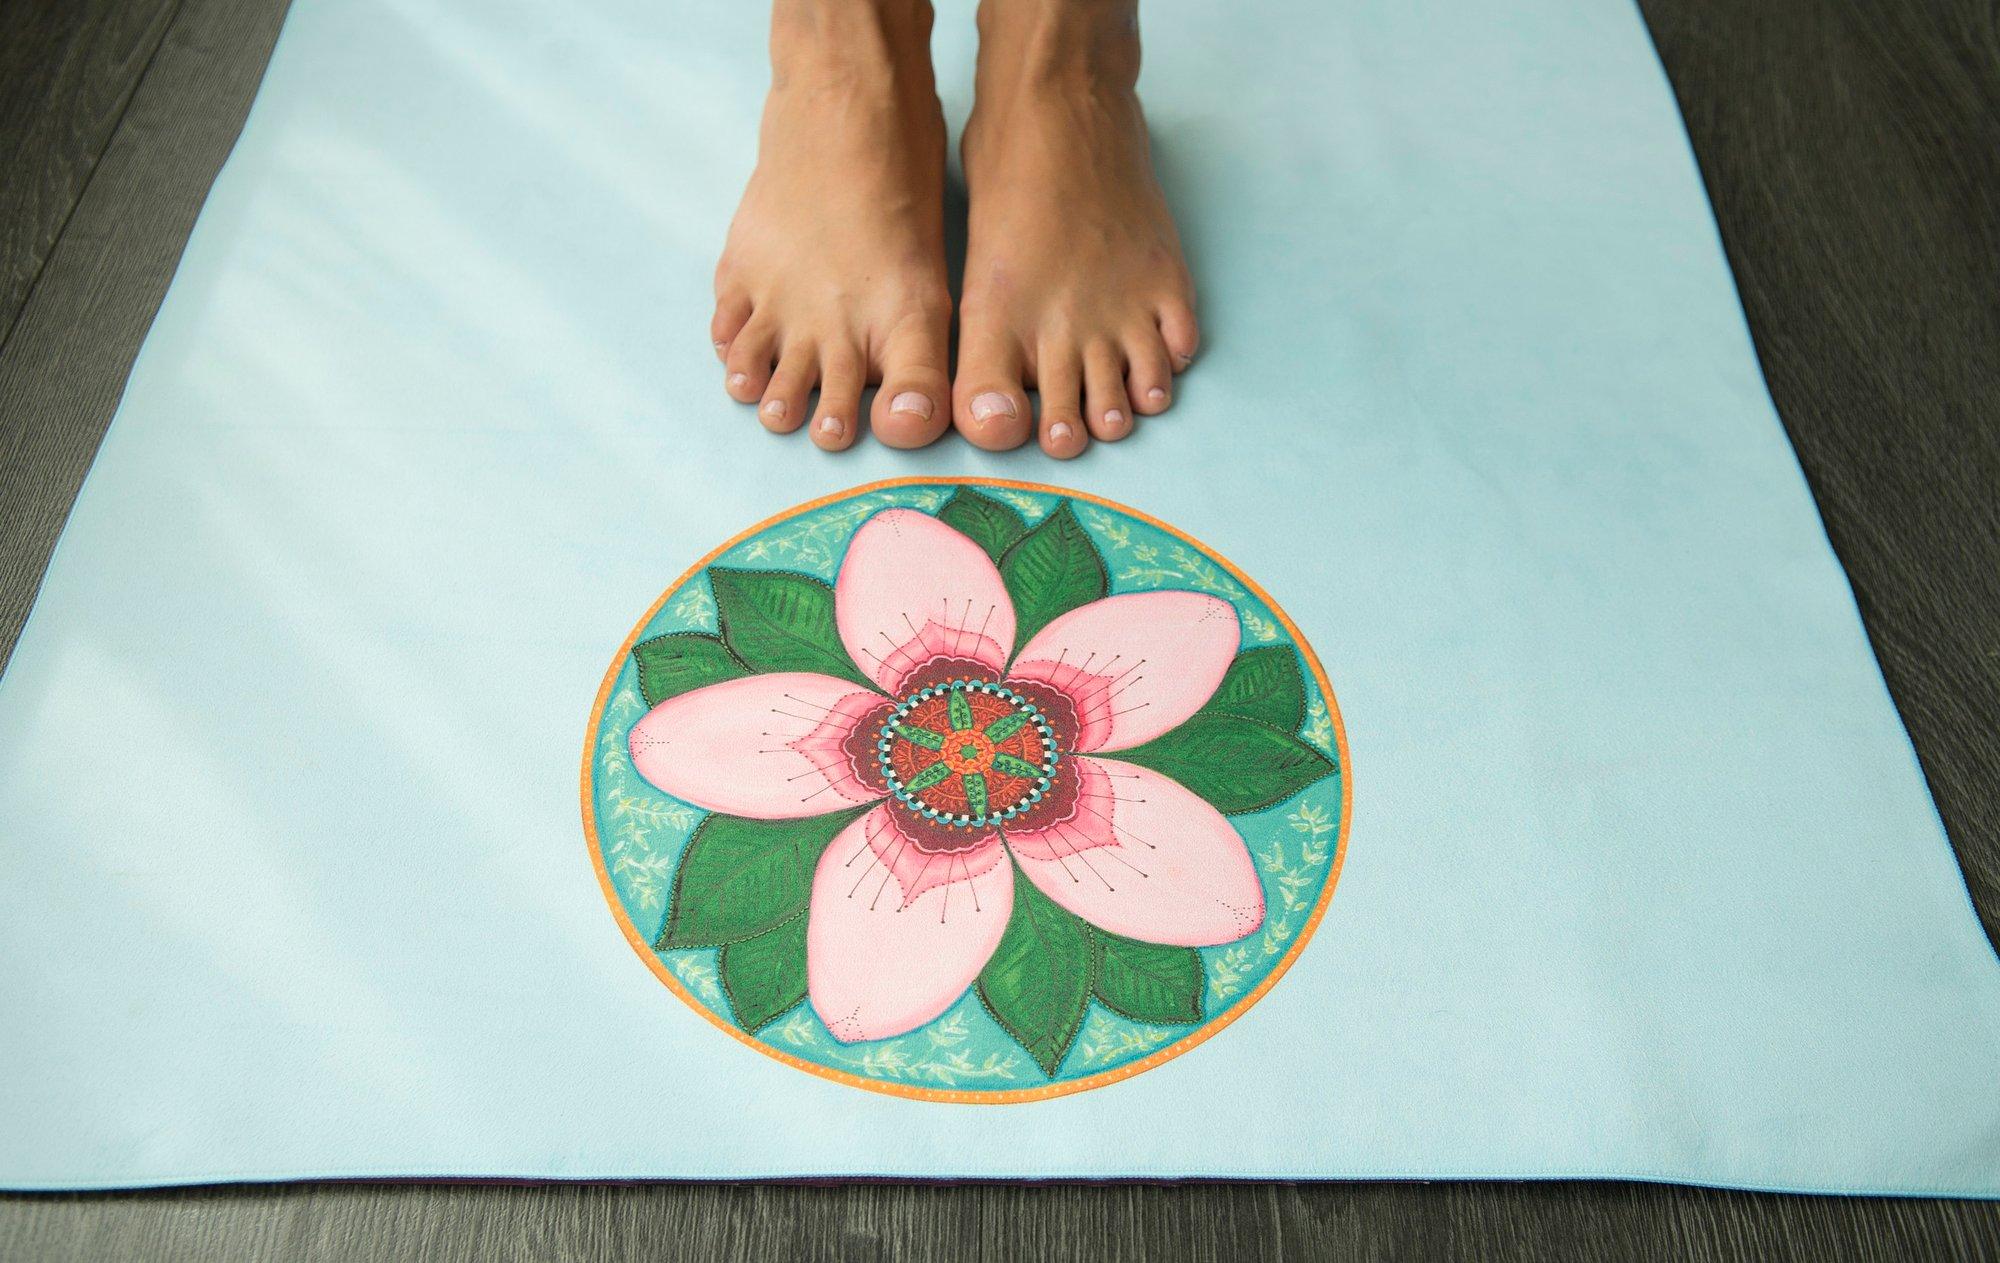 Mandala Yoga Towel Blue With Cherry Blossom And White Lotus